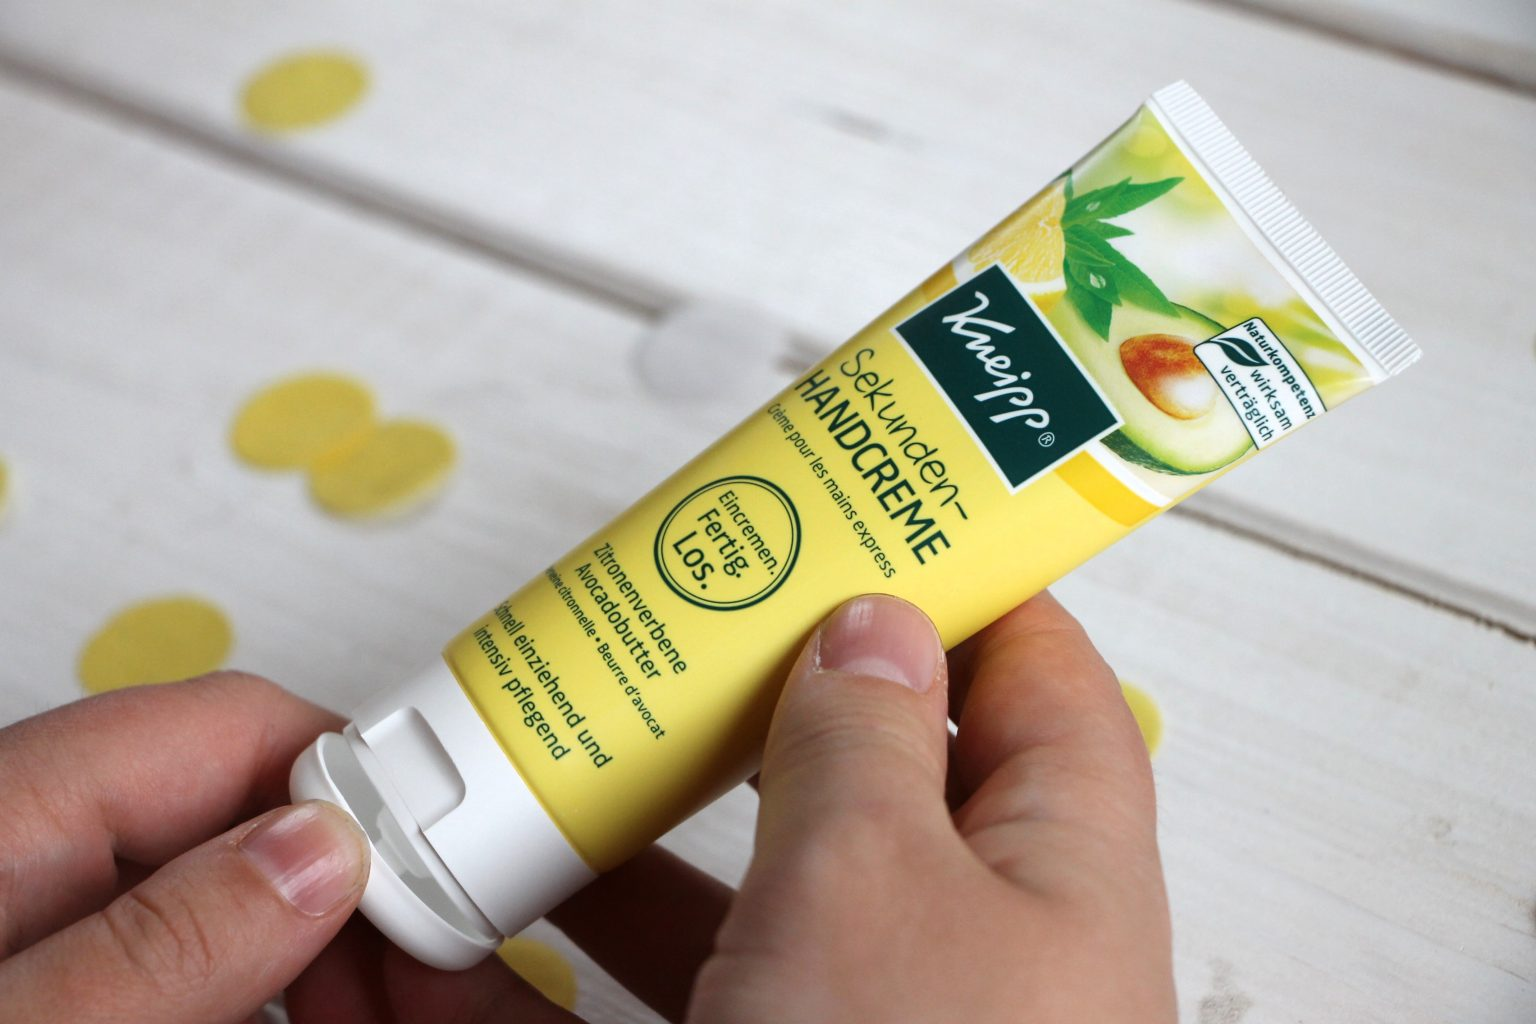 Hautpflege Winter Tipps - Kneipp Sekunden-Handcreme